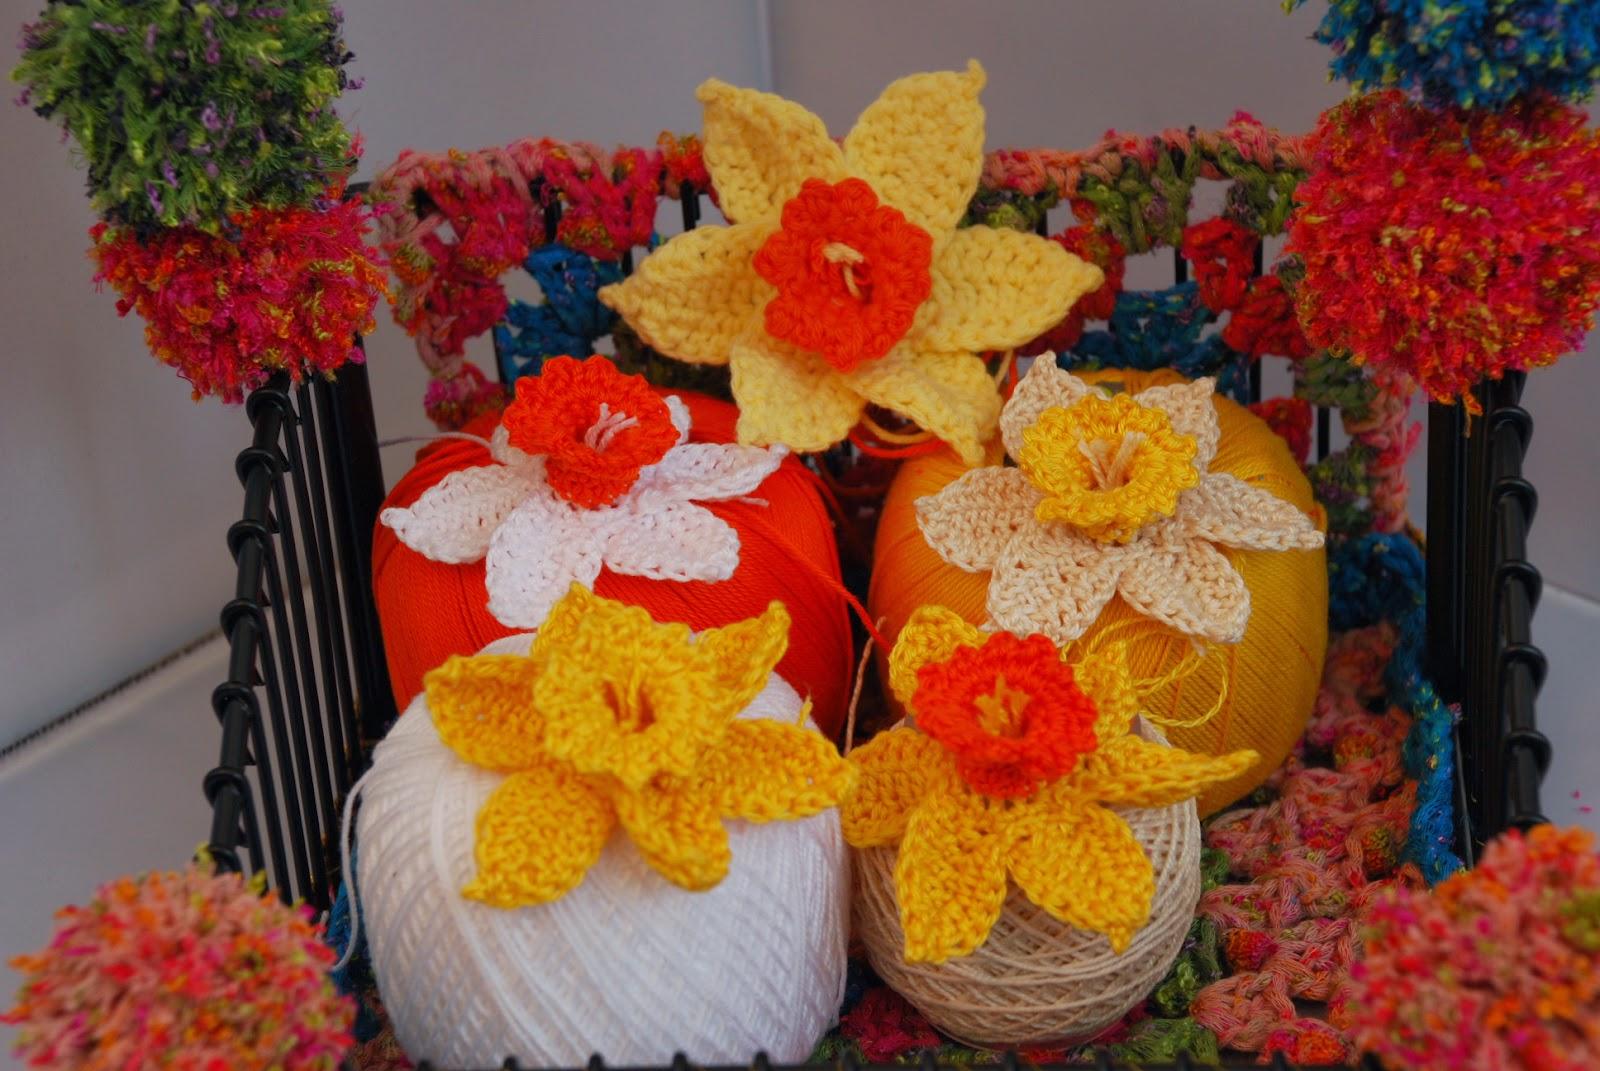 image of Amjaylou's crochet daffodils